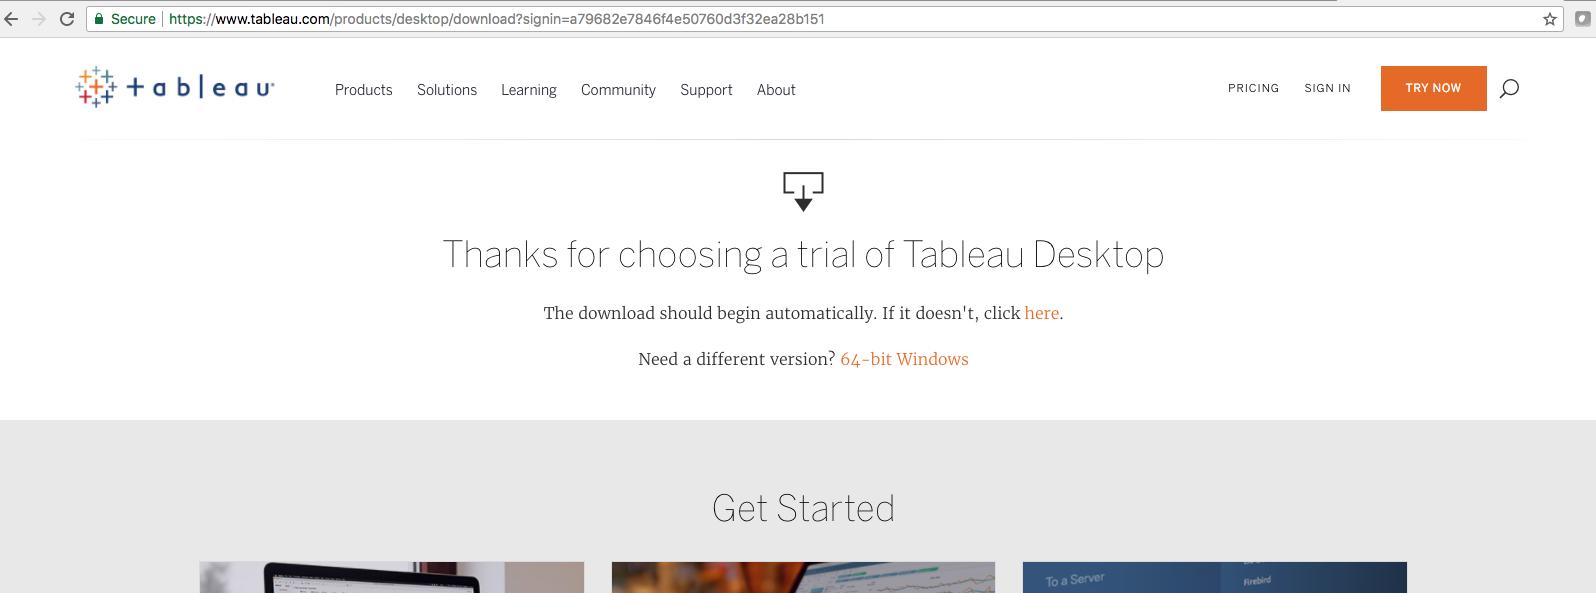 Tableau - Big Data Analytics with Hadoop 3